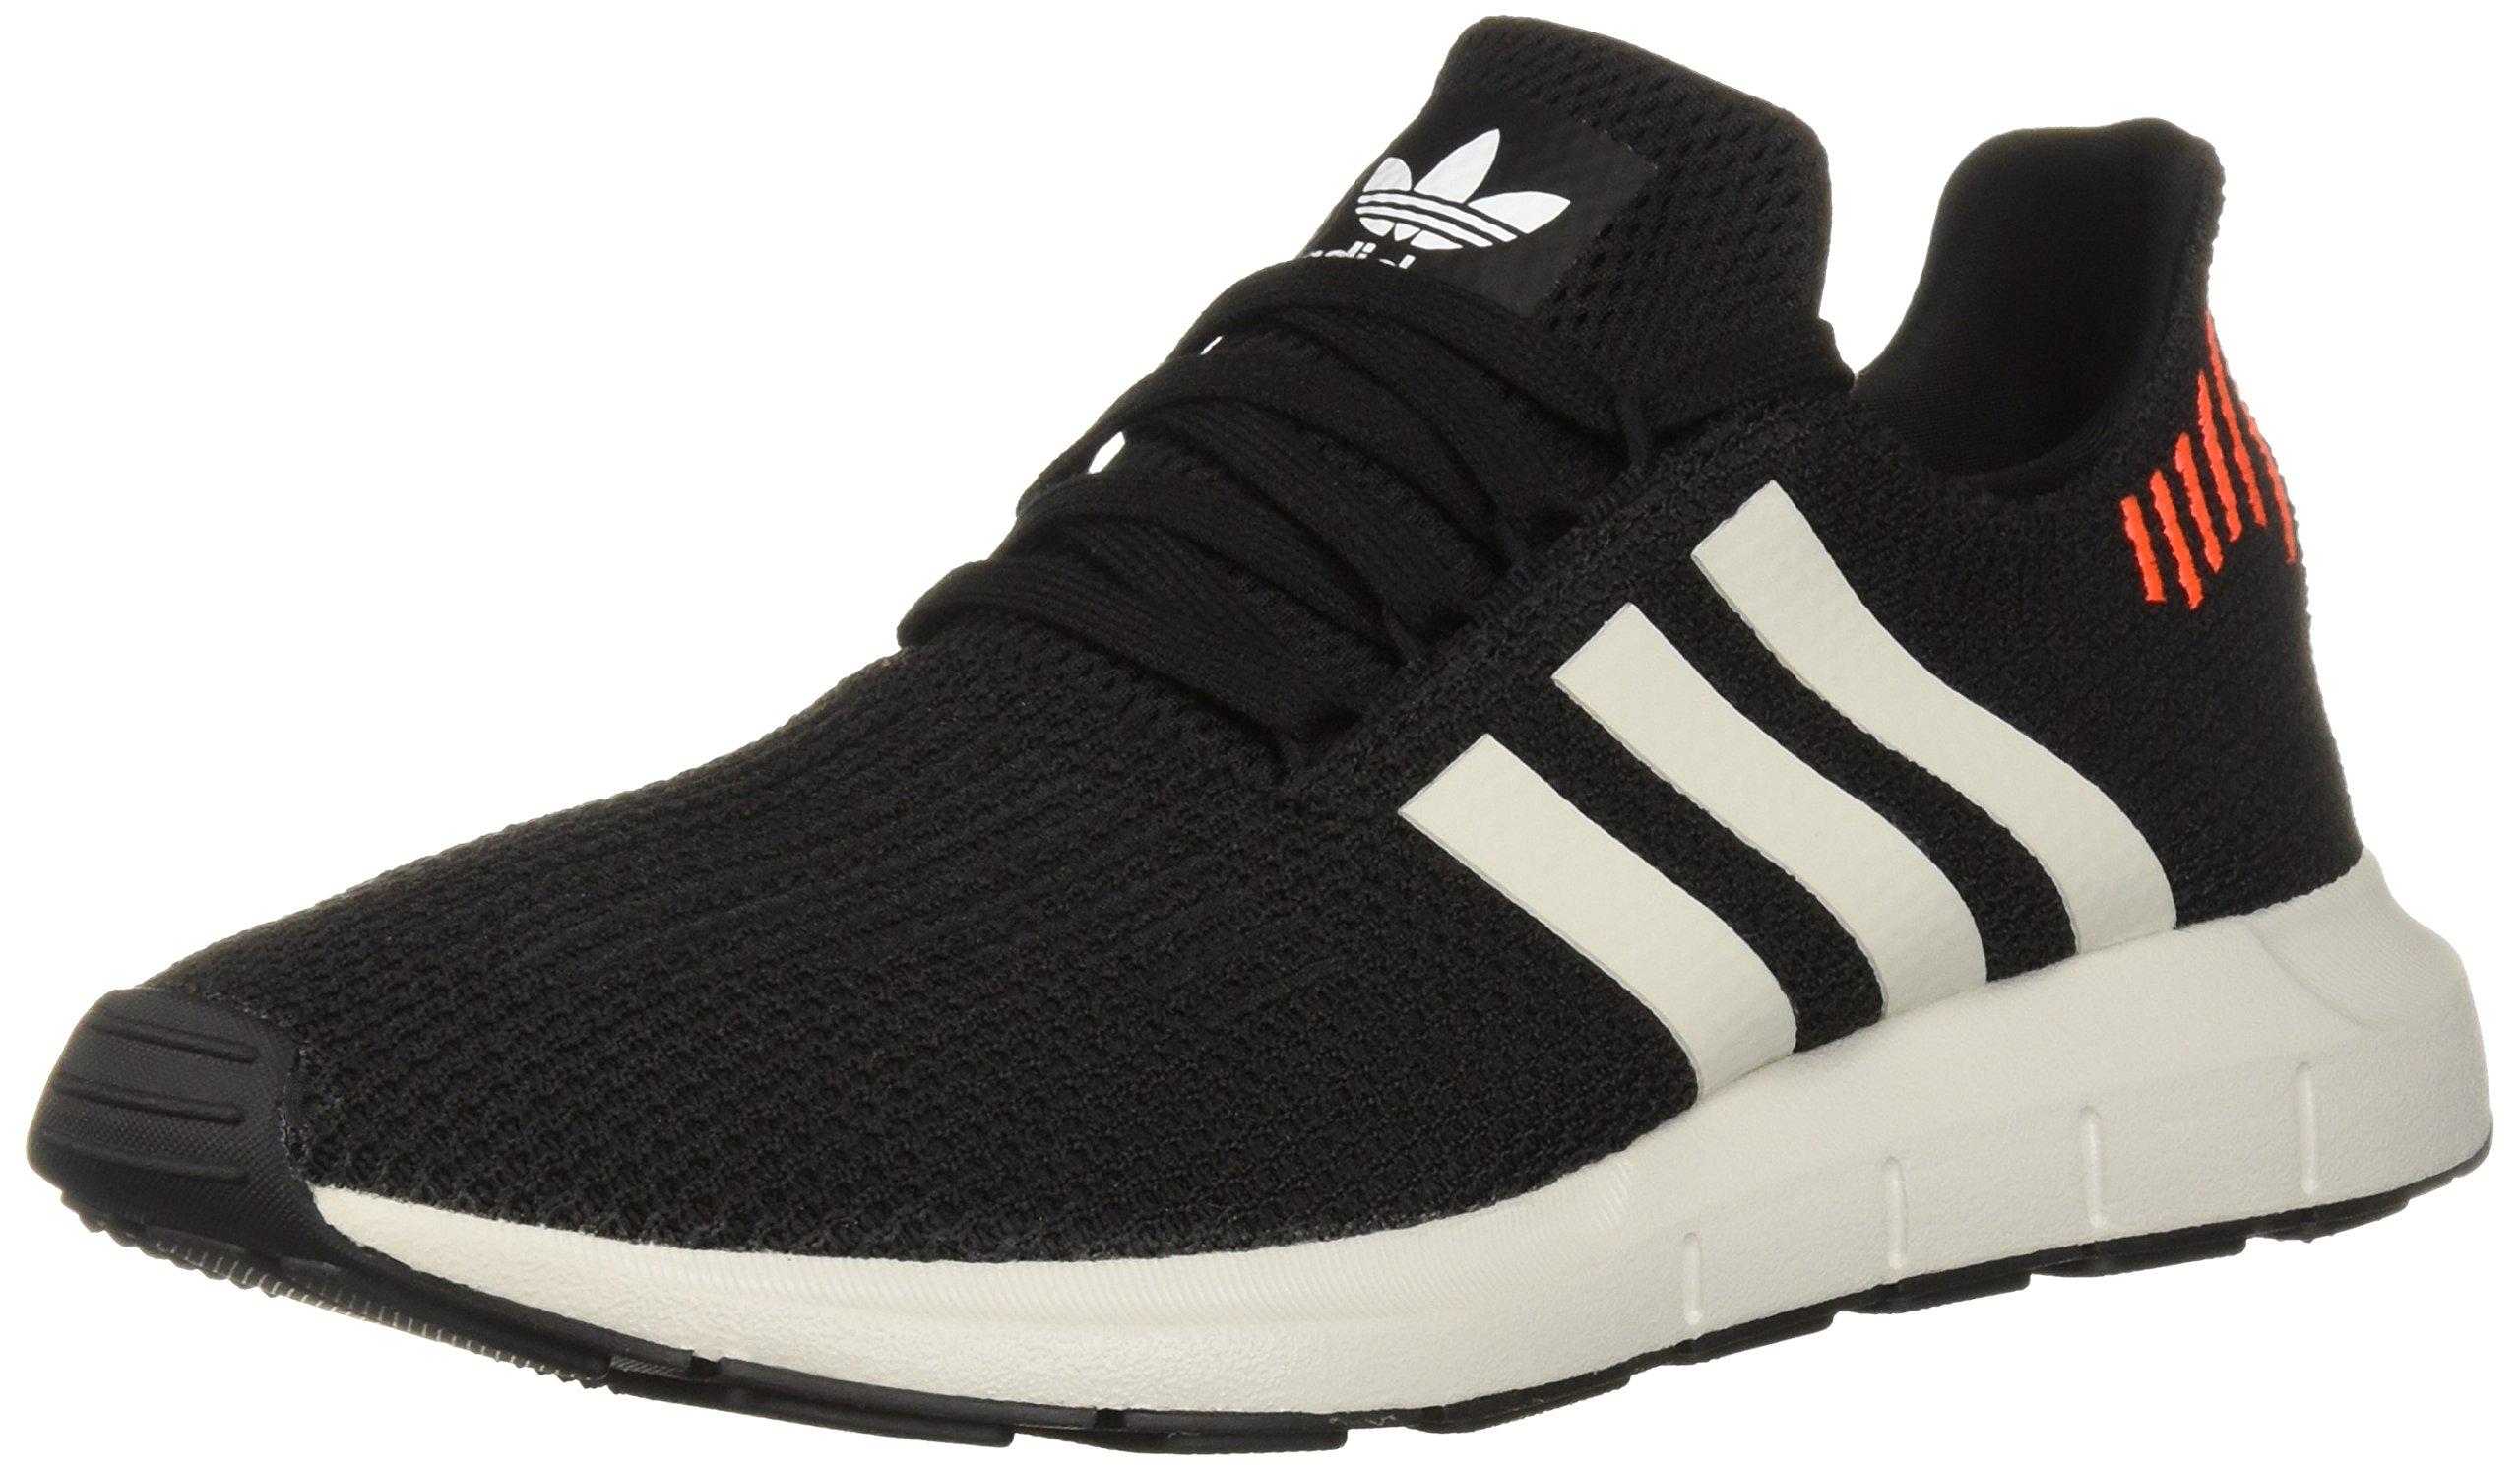 Galleon - Adidas Originals Men s Swift Running Shoe b084206869c8